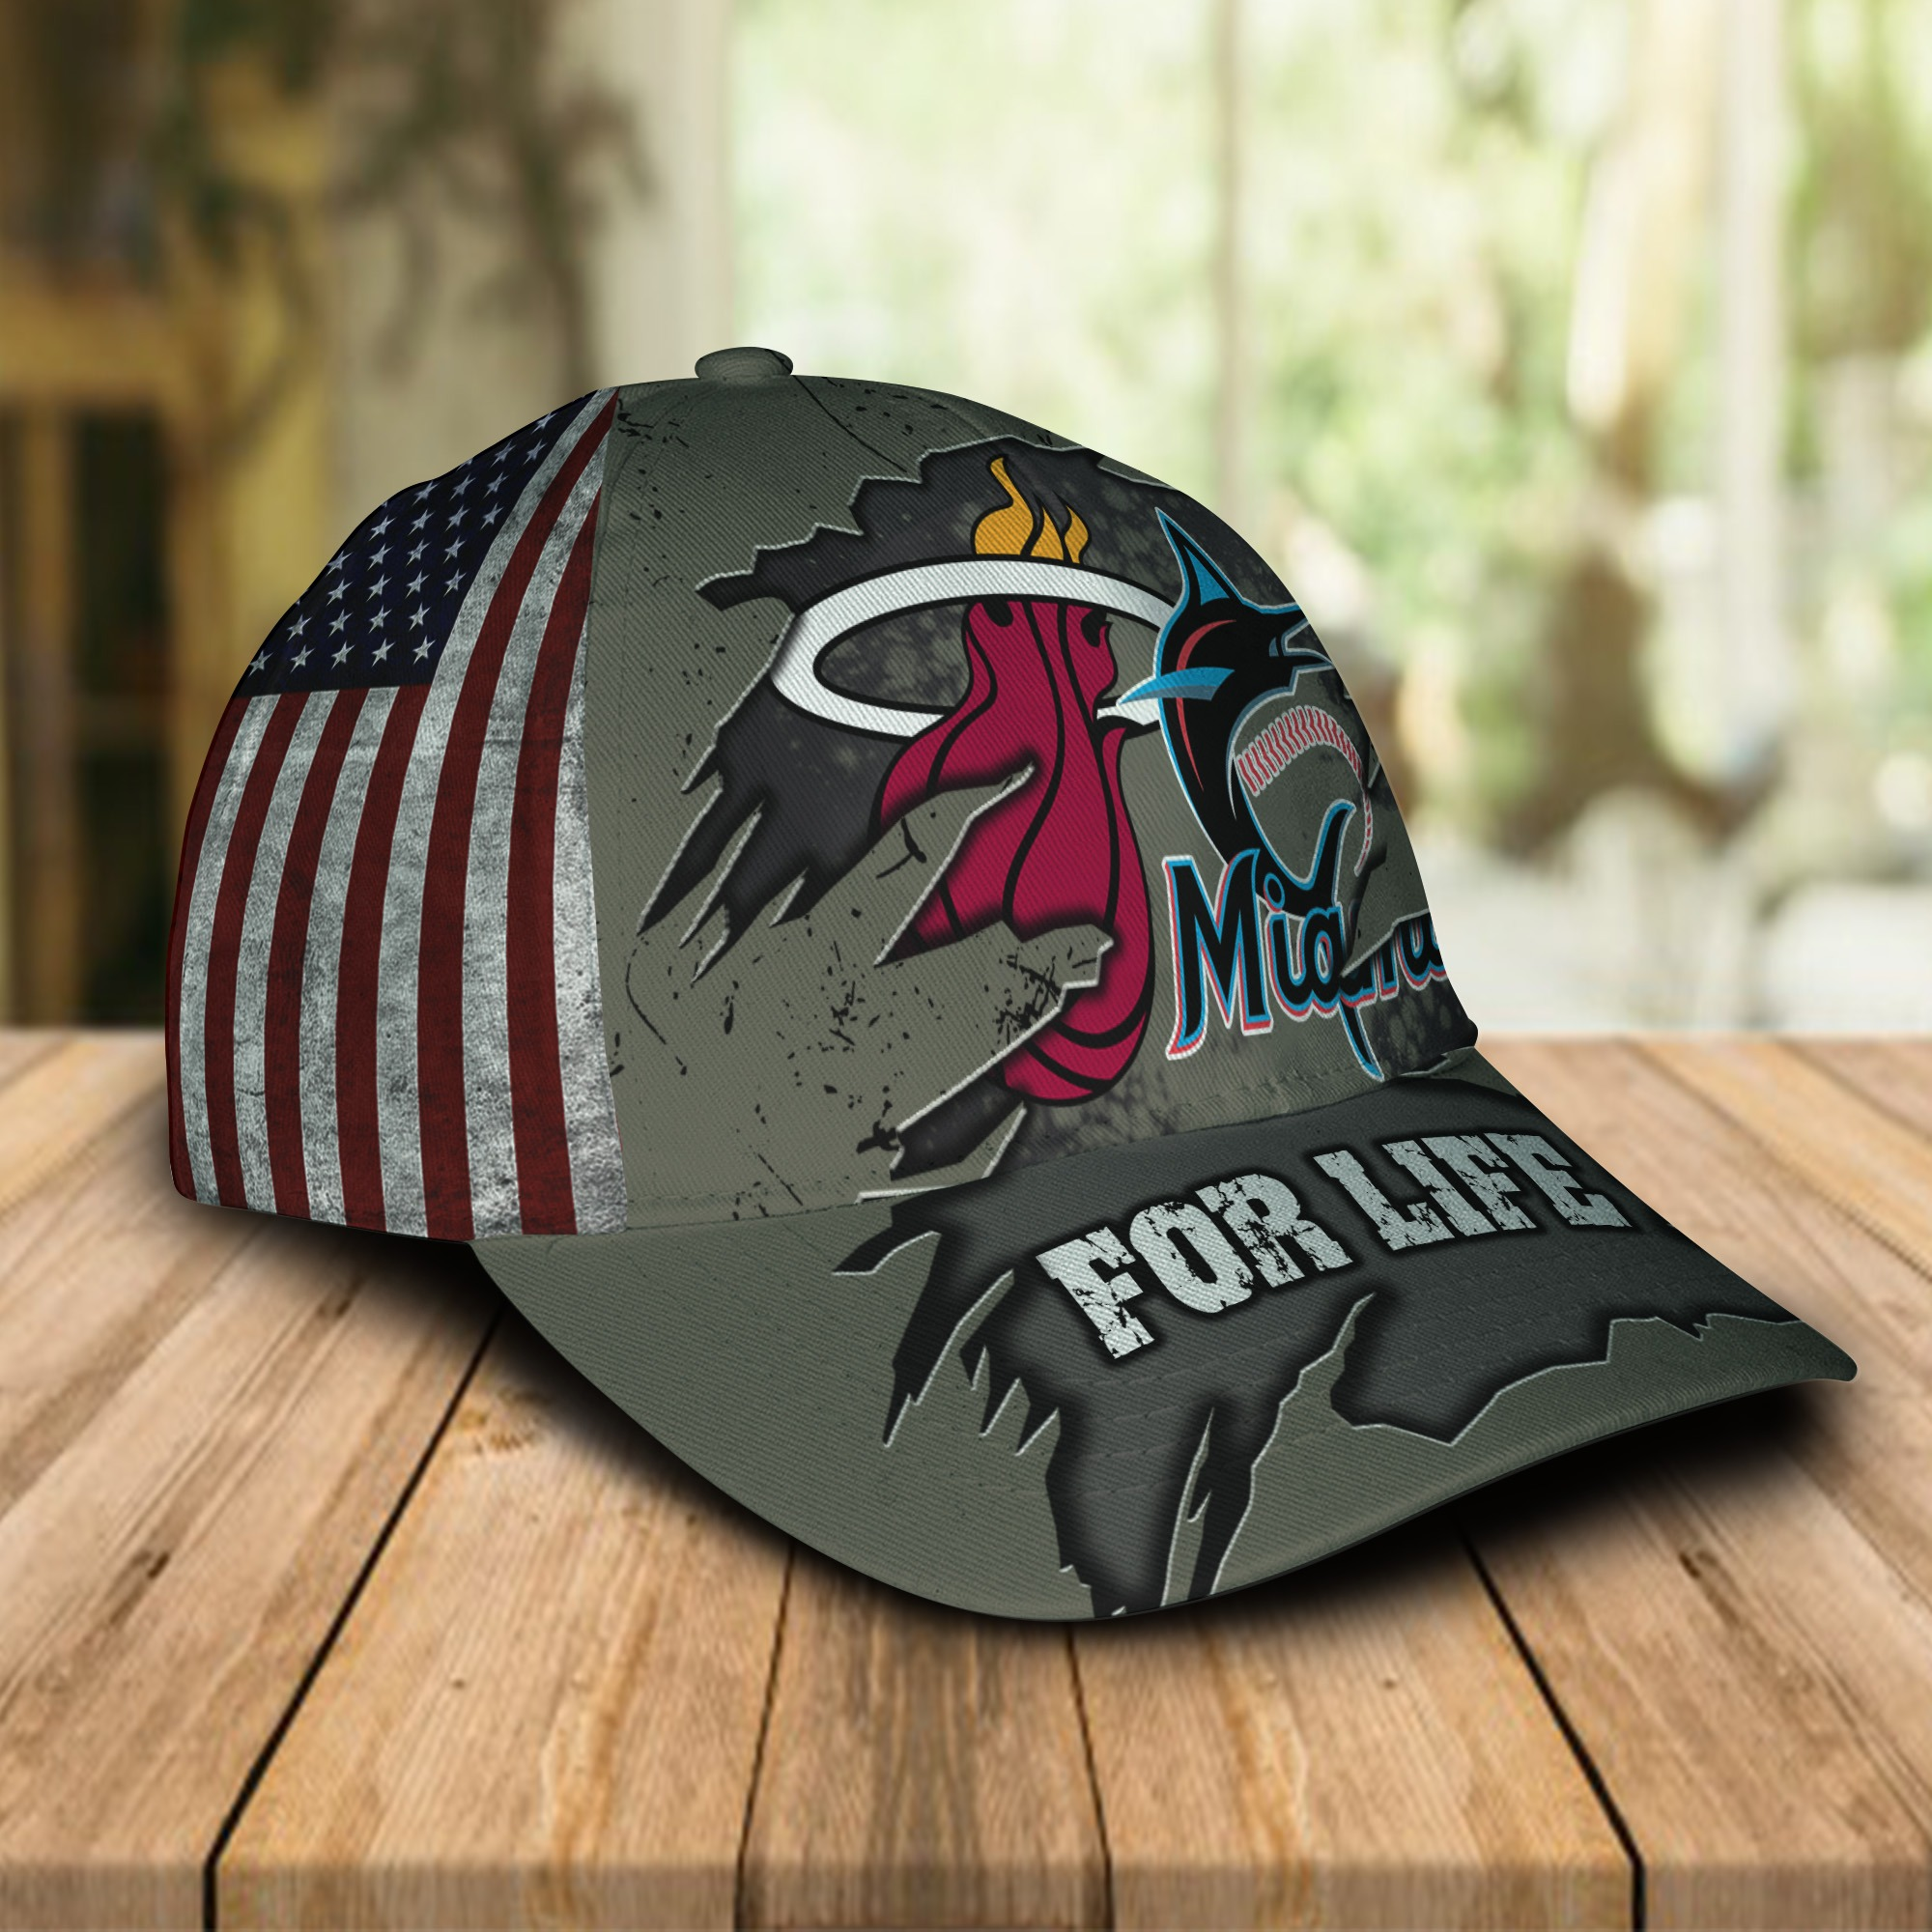 Miami Marlins Miami Heat For Life Cap 1